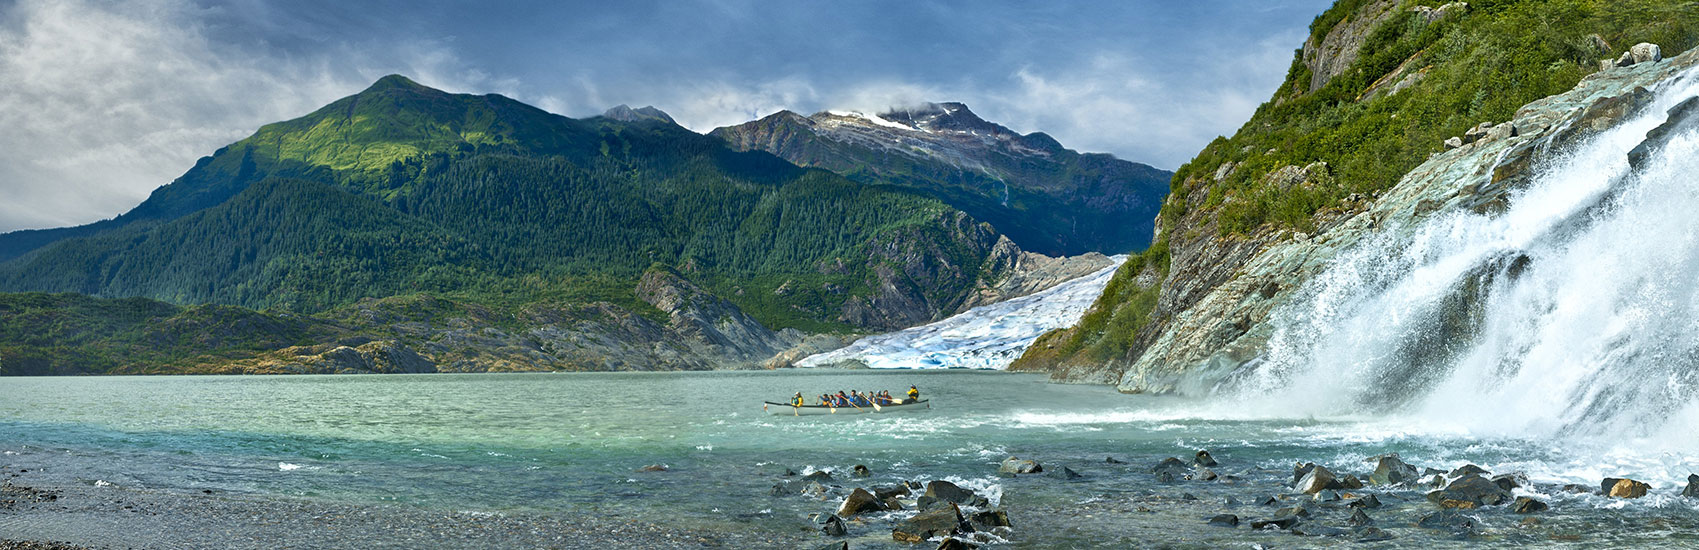 NCL is Sailing to Alaska Summer 2021 4